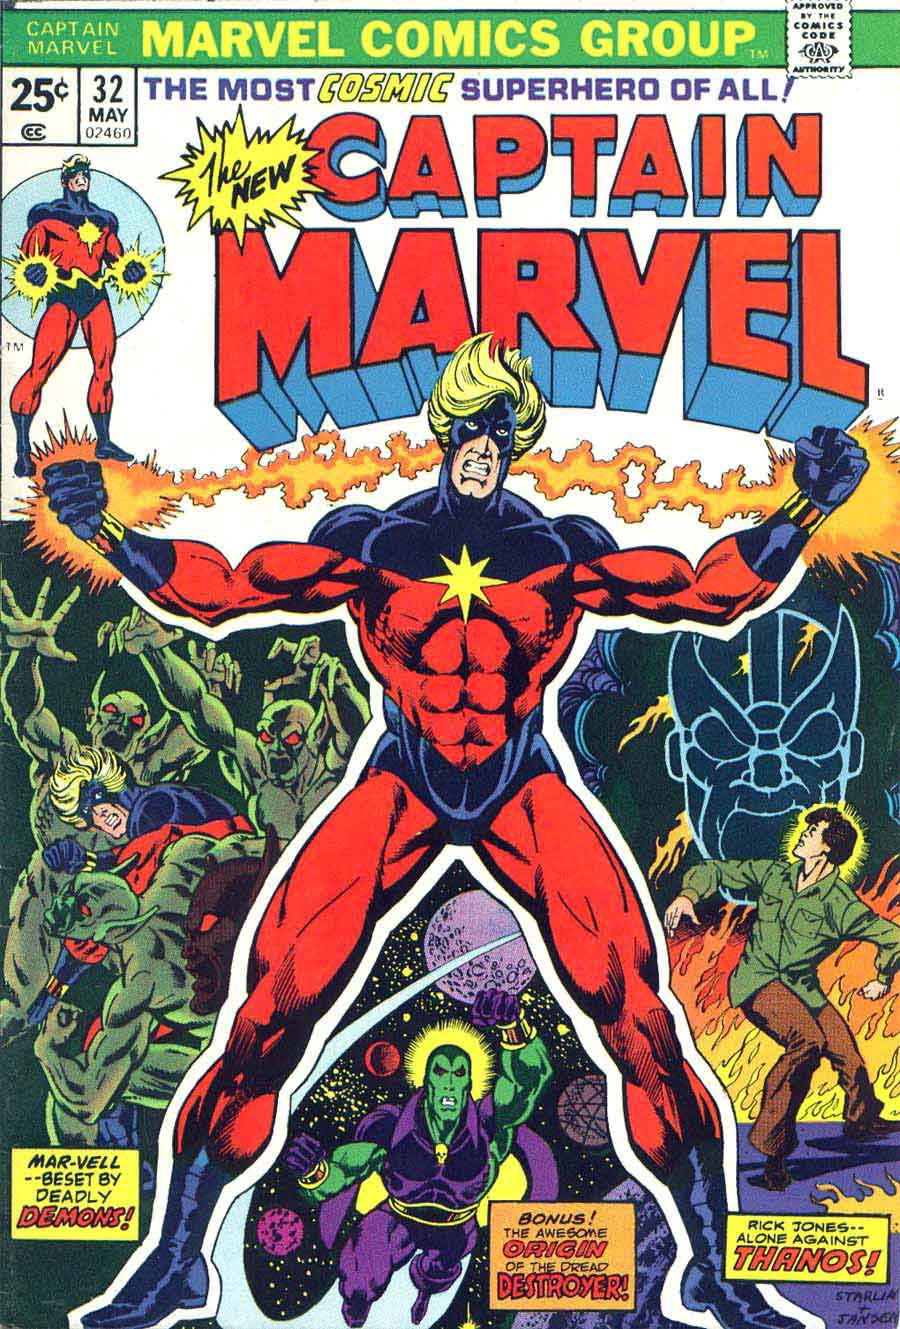 Captain Marvel #32 marvel 1970s bronze age comic book cover art by Jim Starlin